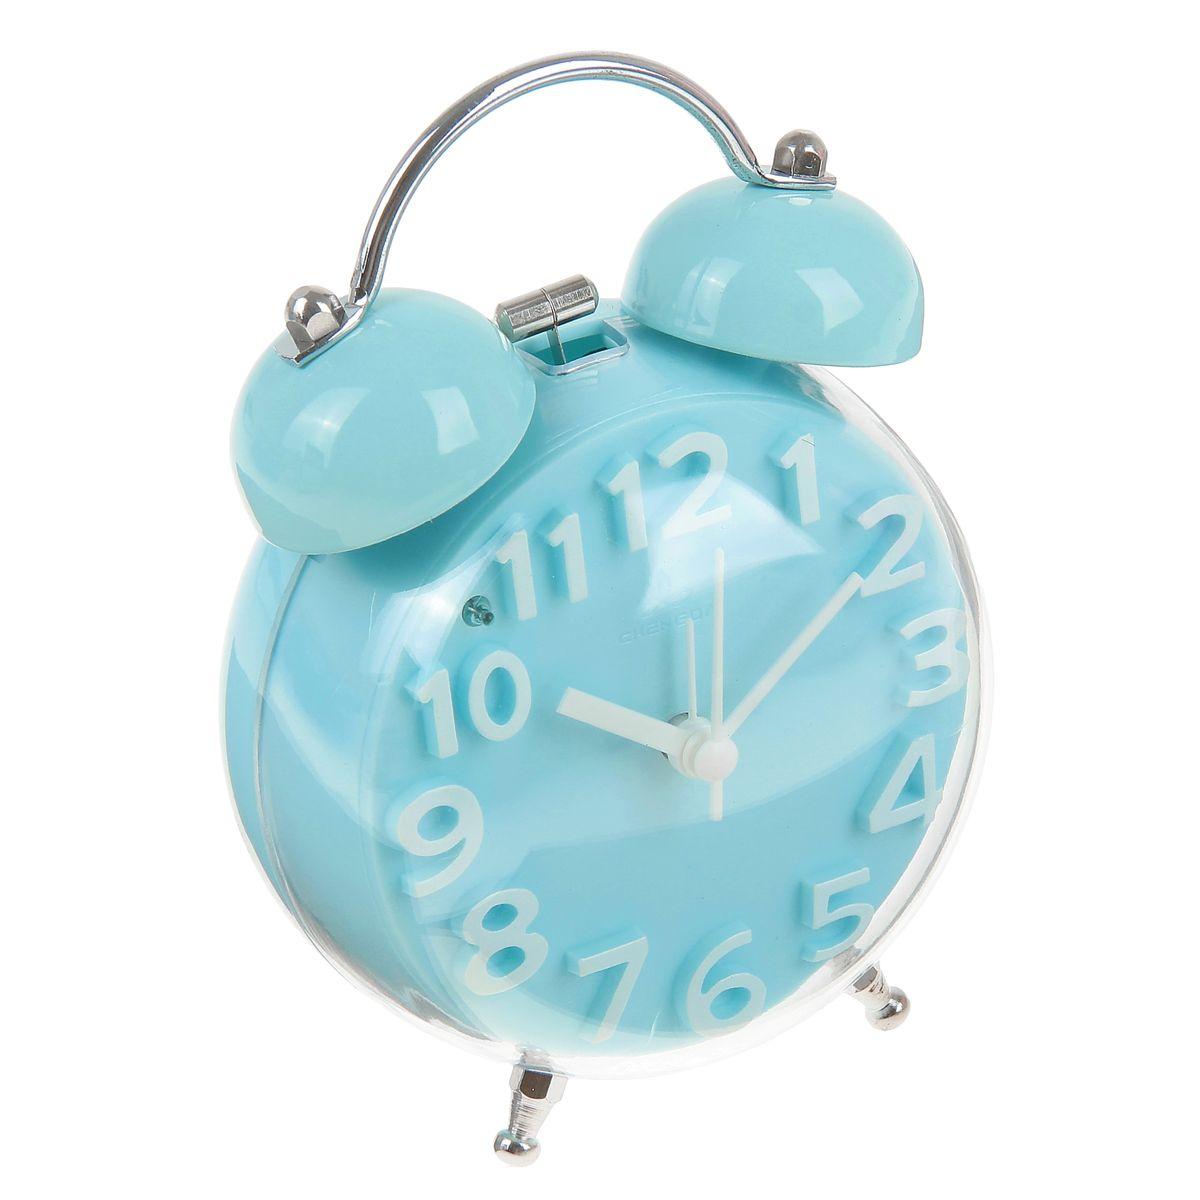 Часы-будильник Sima-land, цвет: голубой. 911447